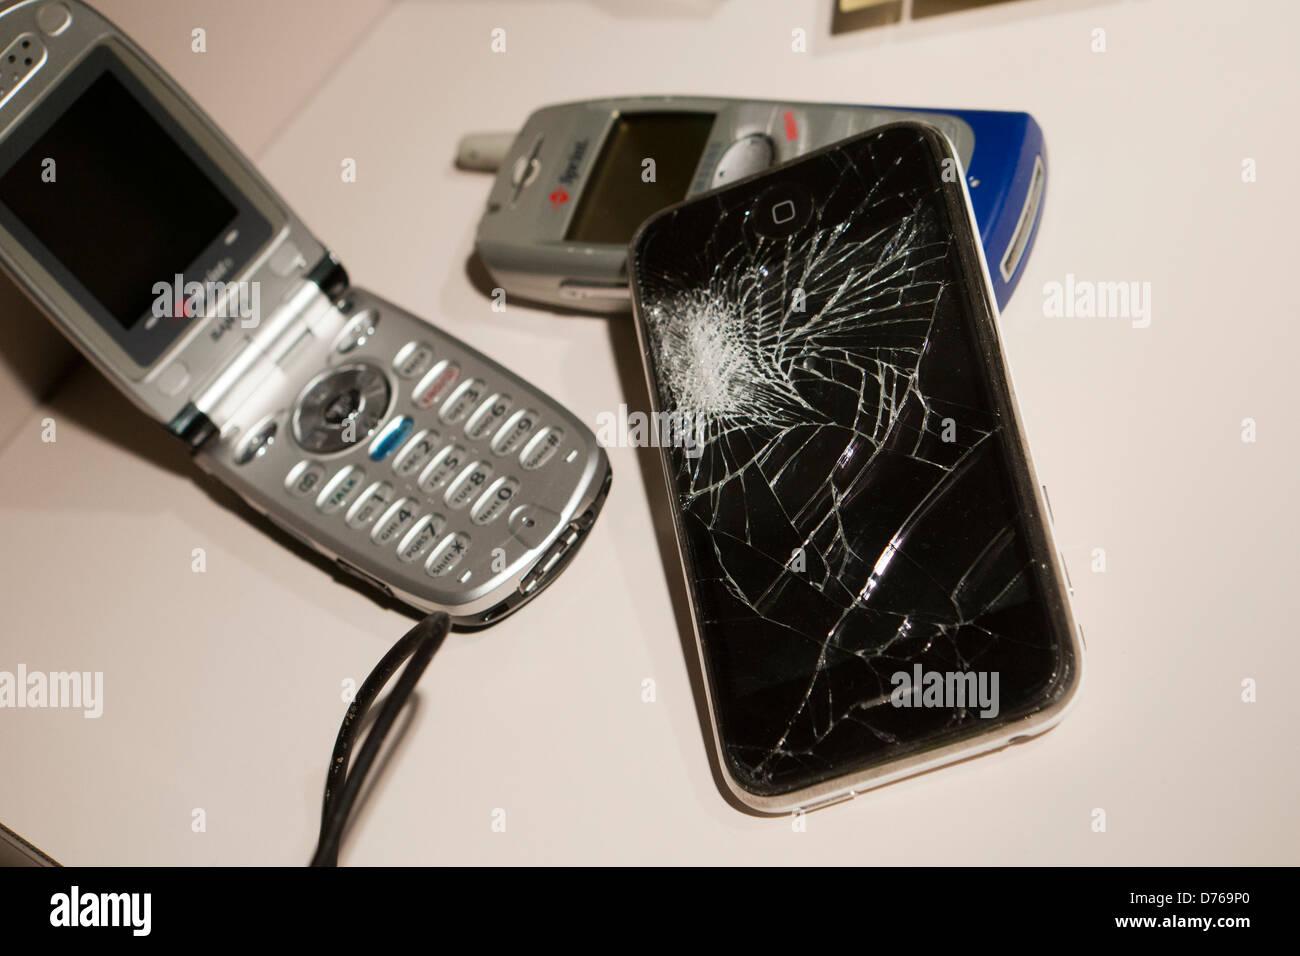 Smartphone-Display gebrochen Stockbild